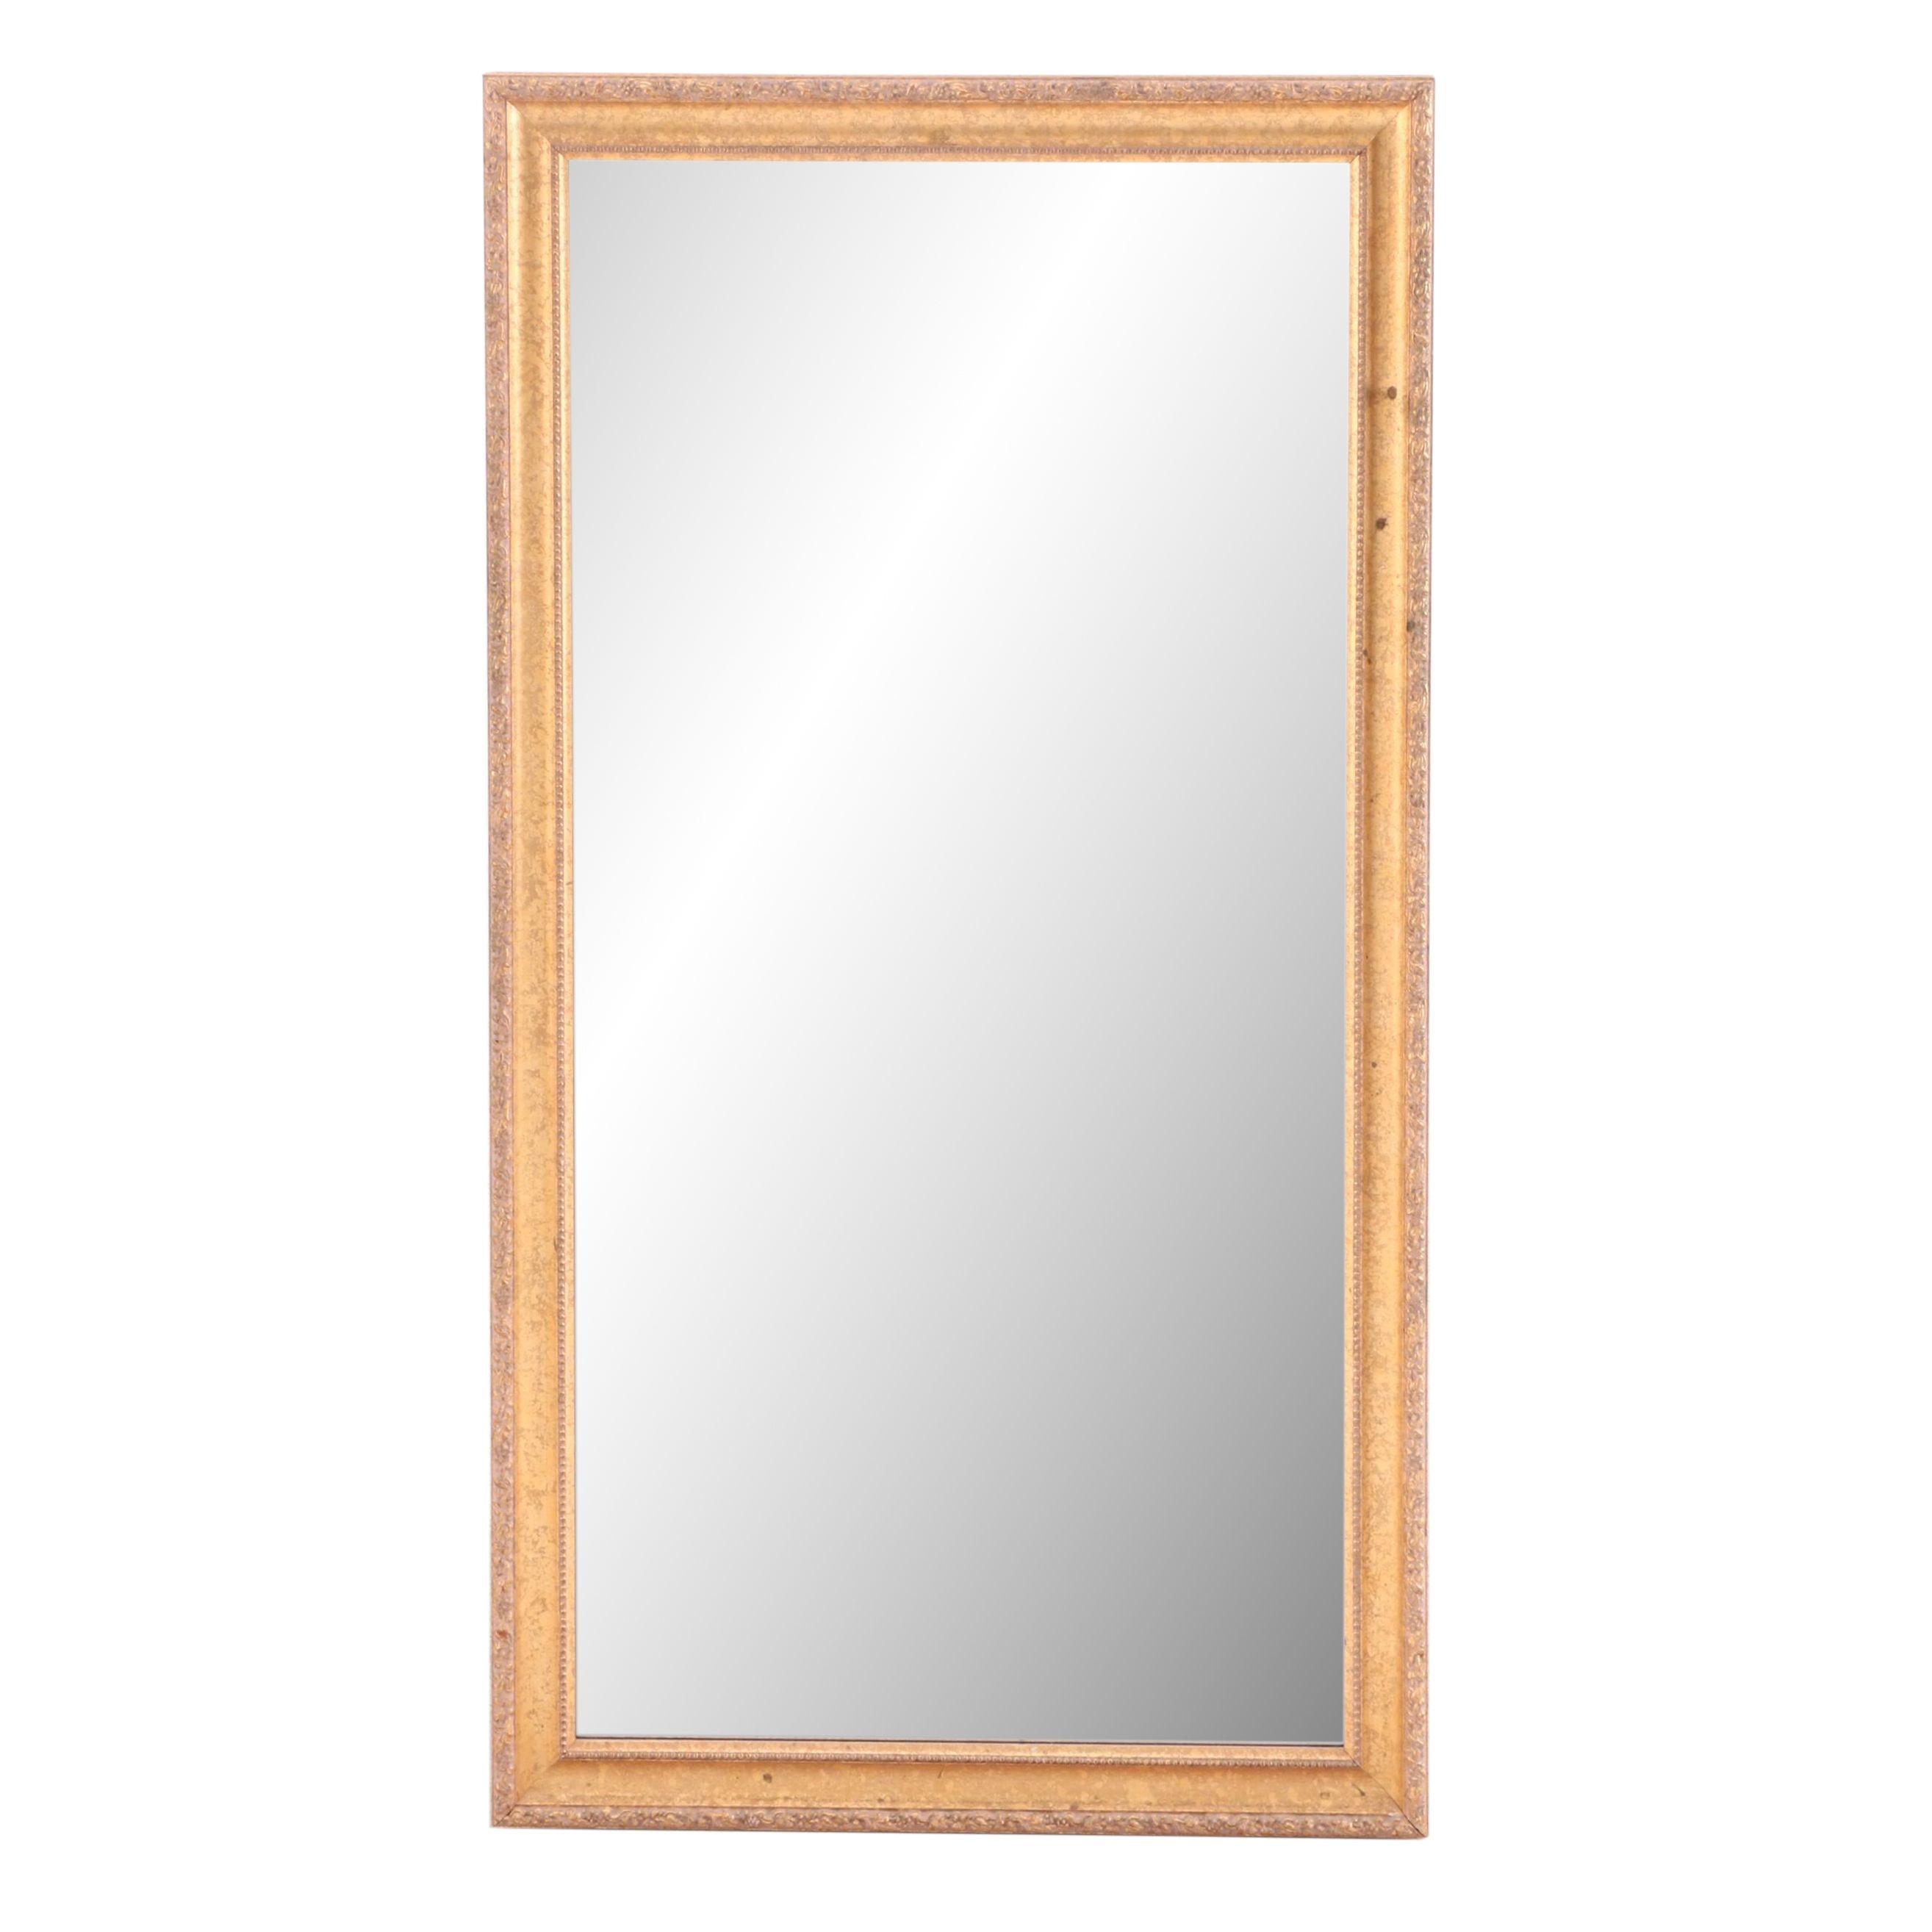 Gilt Finish Wall Mirror